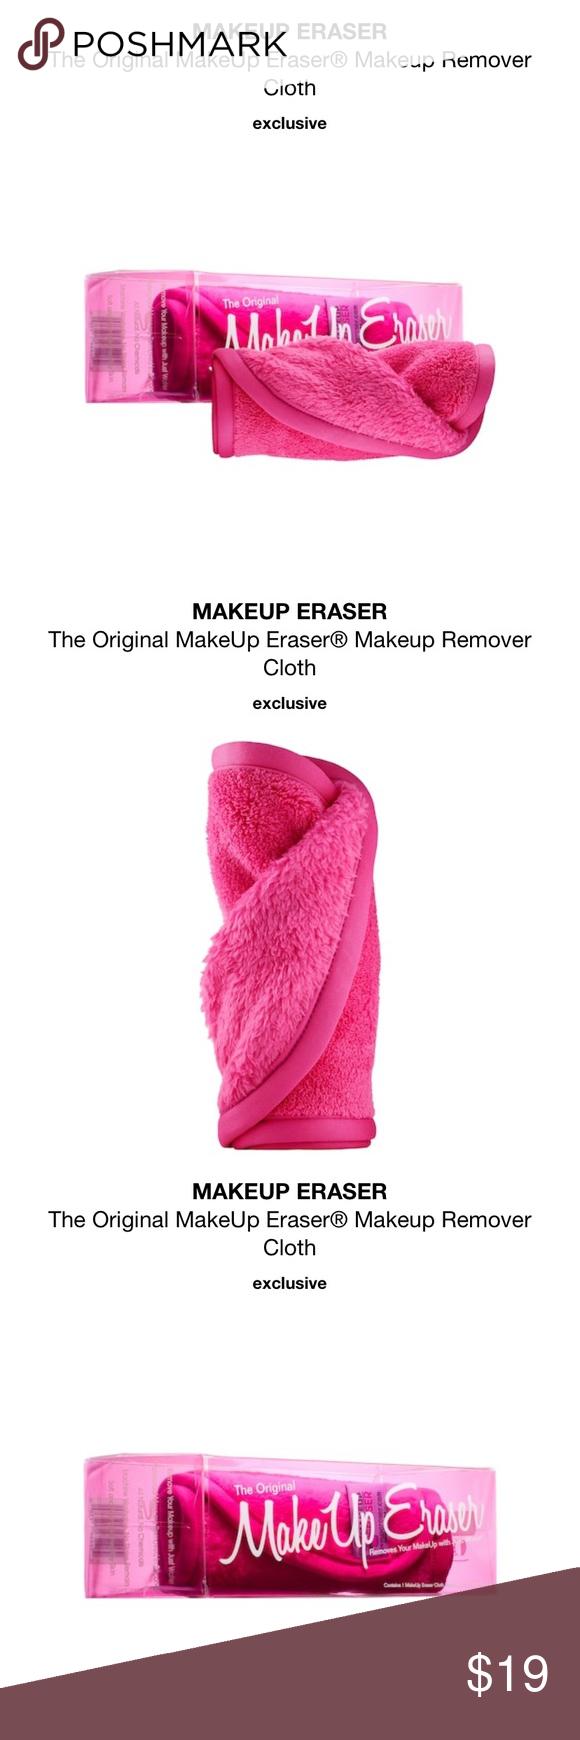 Makeup Eraser the original makeup remover cloth in 2020